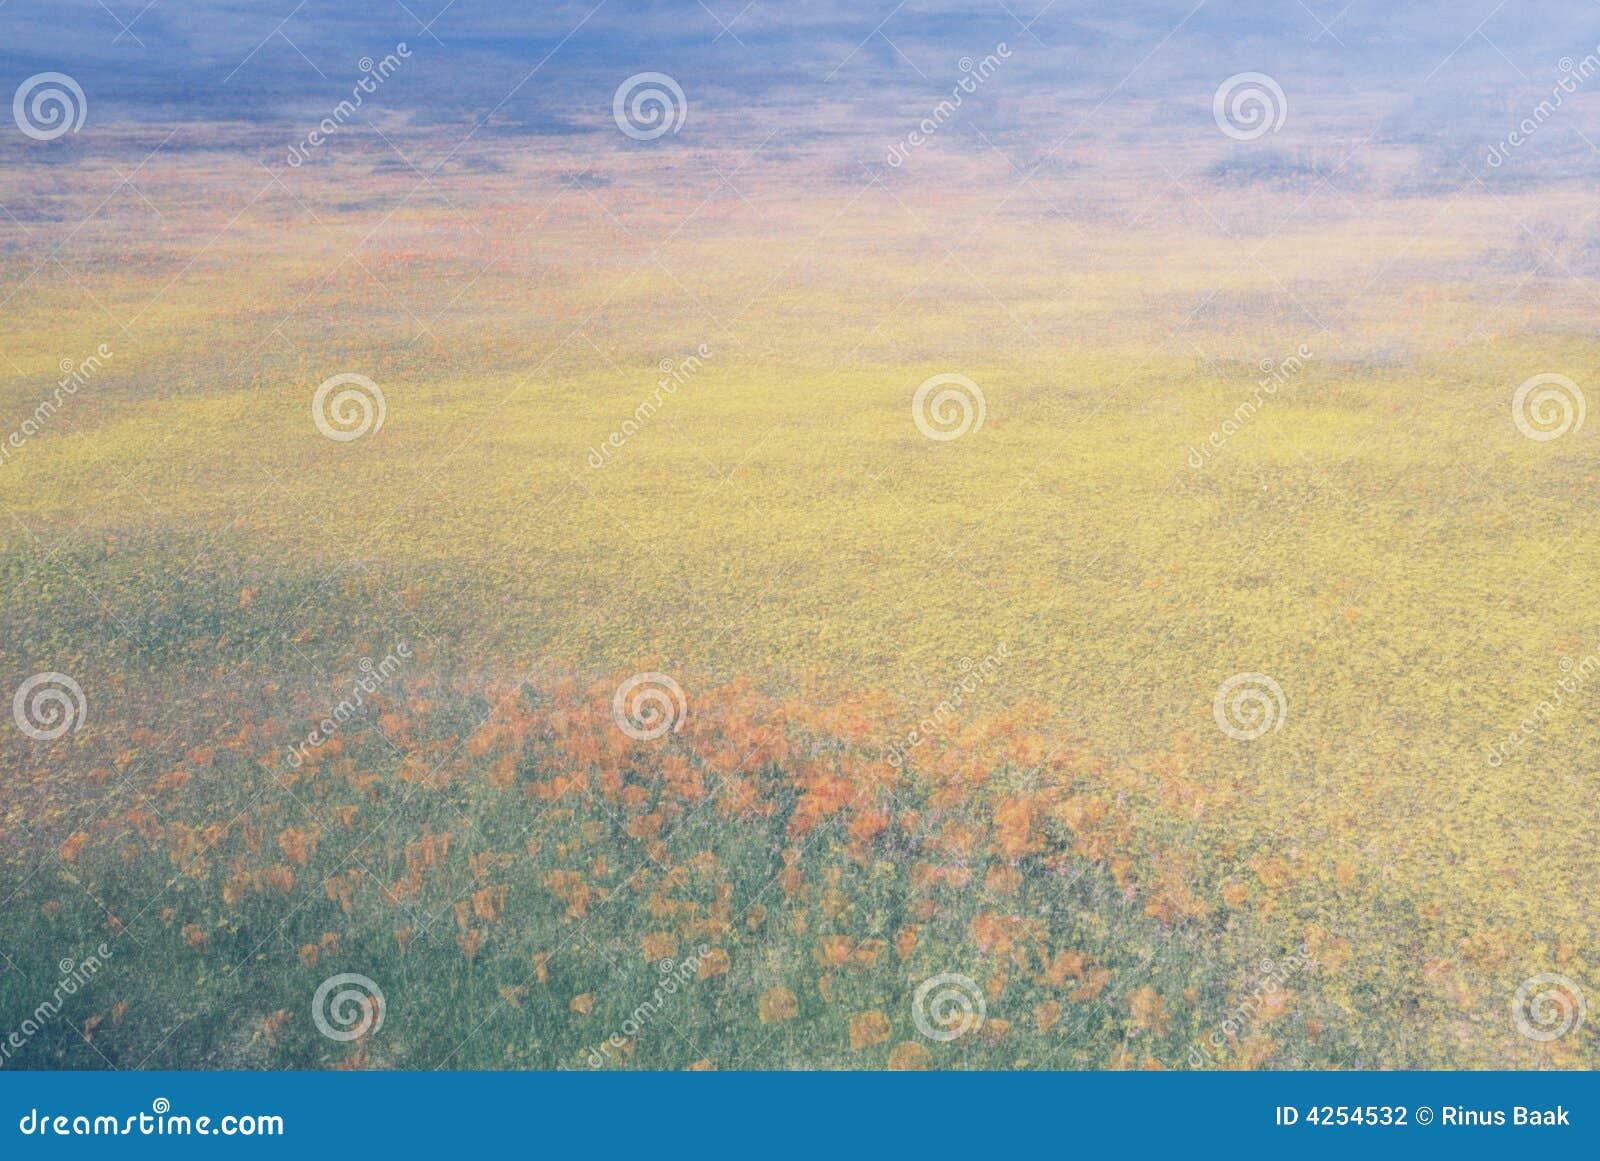 абстрактный цветок поля